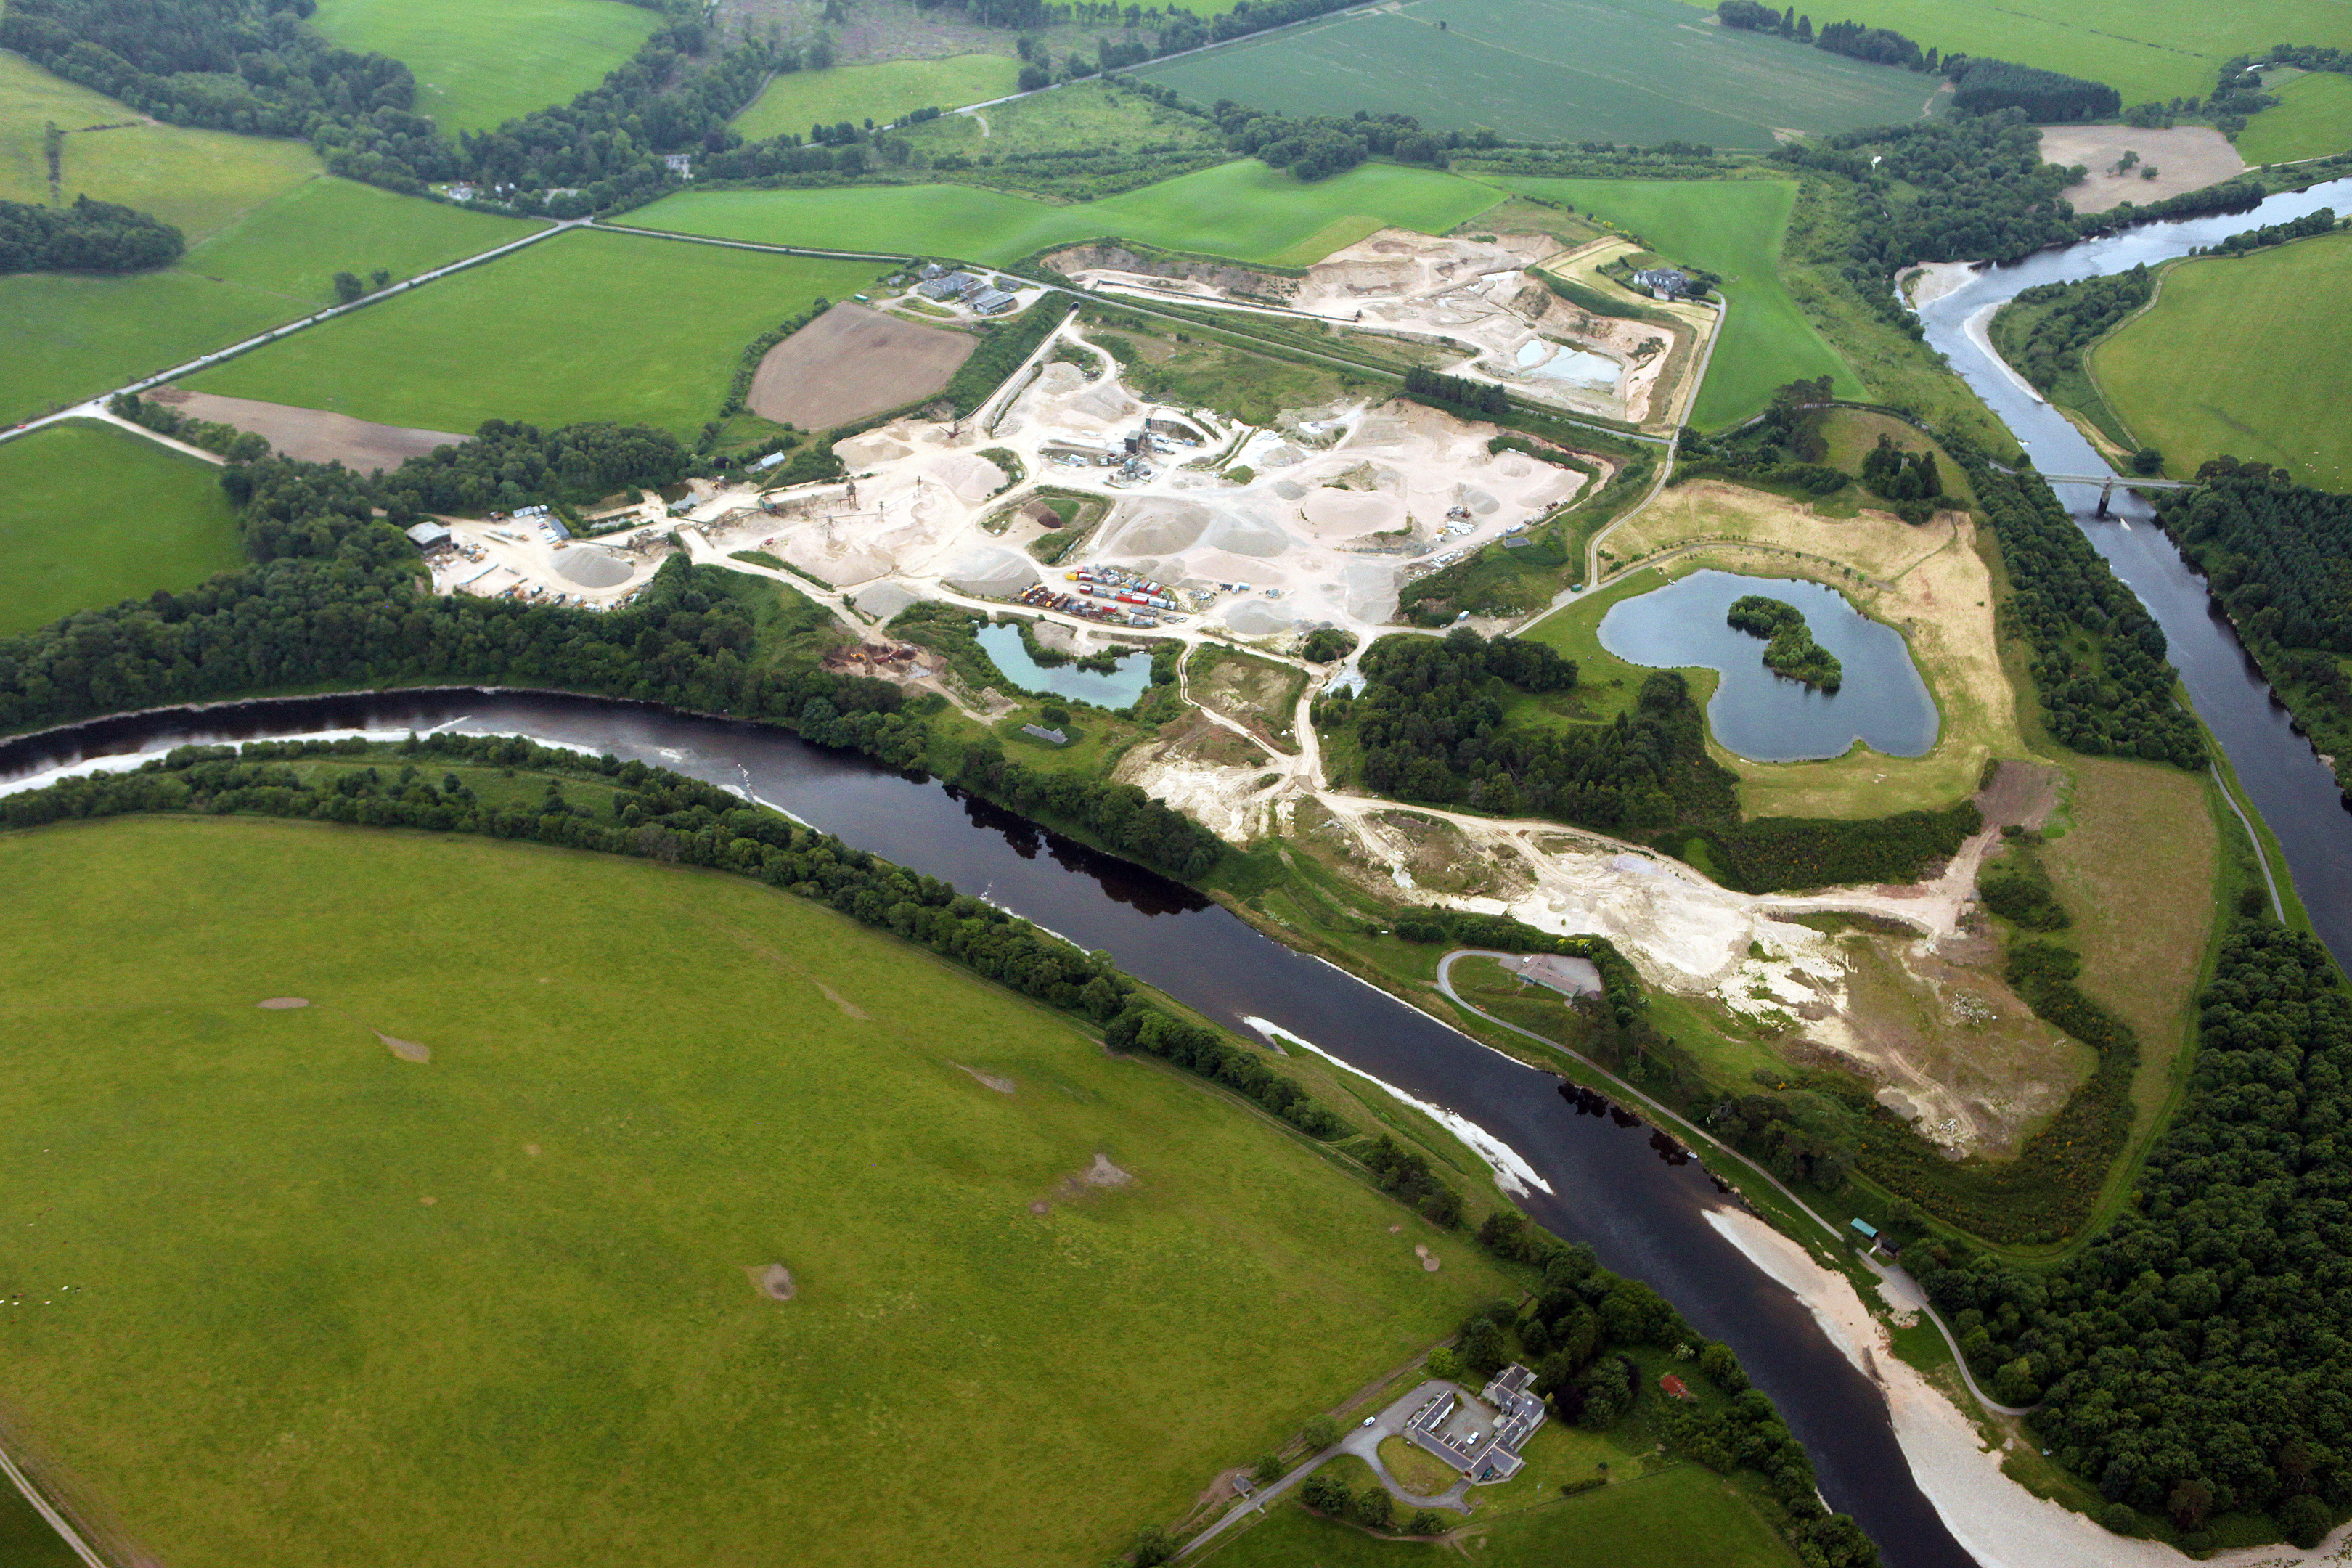 The Park Quarry  site  where Chap Group wants to build  a 1,500-home development.